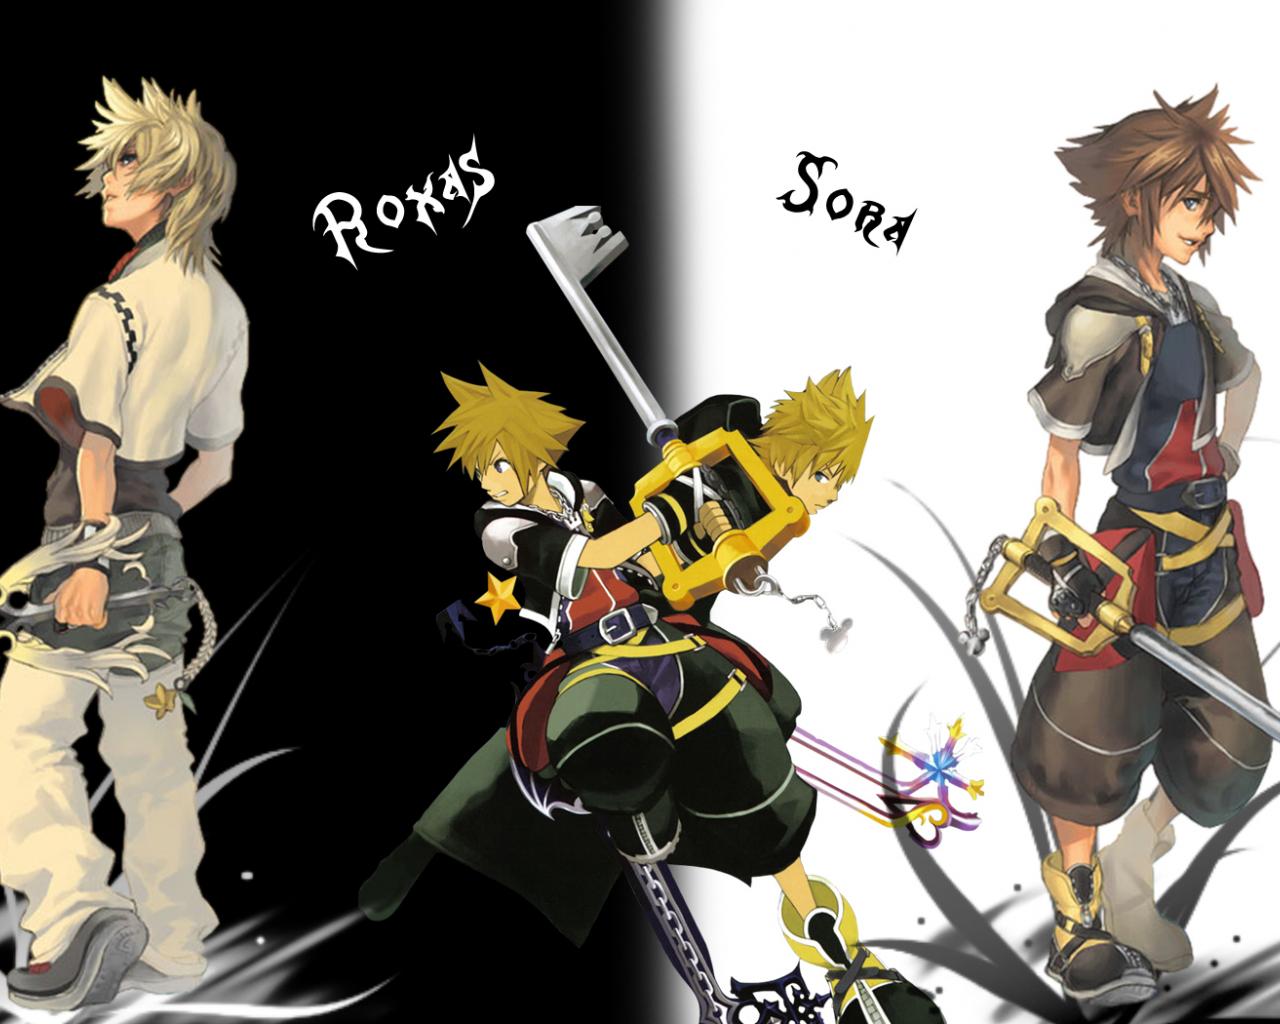 Free Download Kingdom Hearts 3 Sora Wallpaper Kingdom Hearts